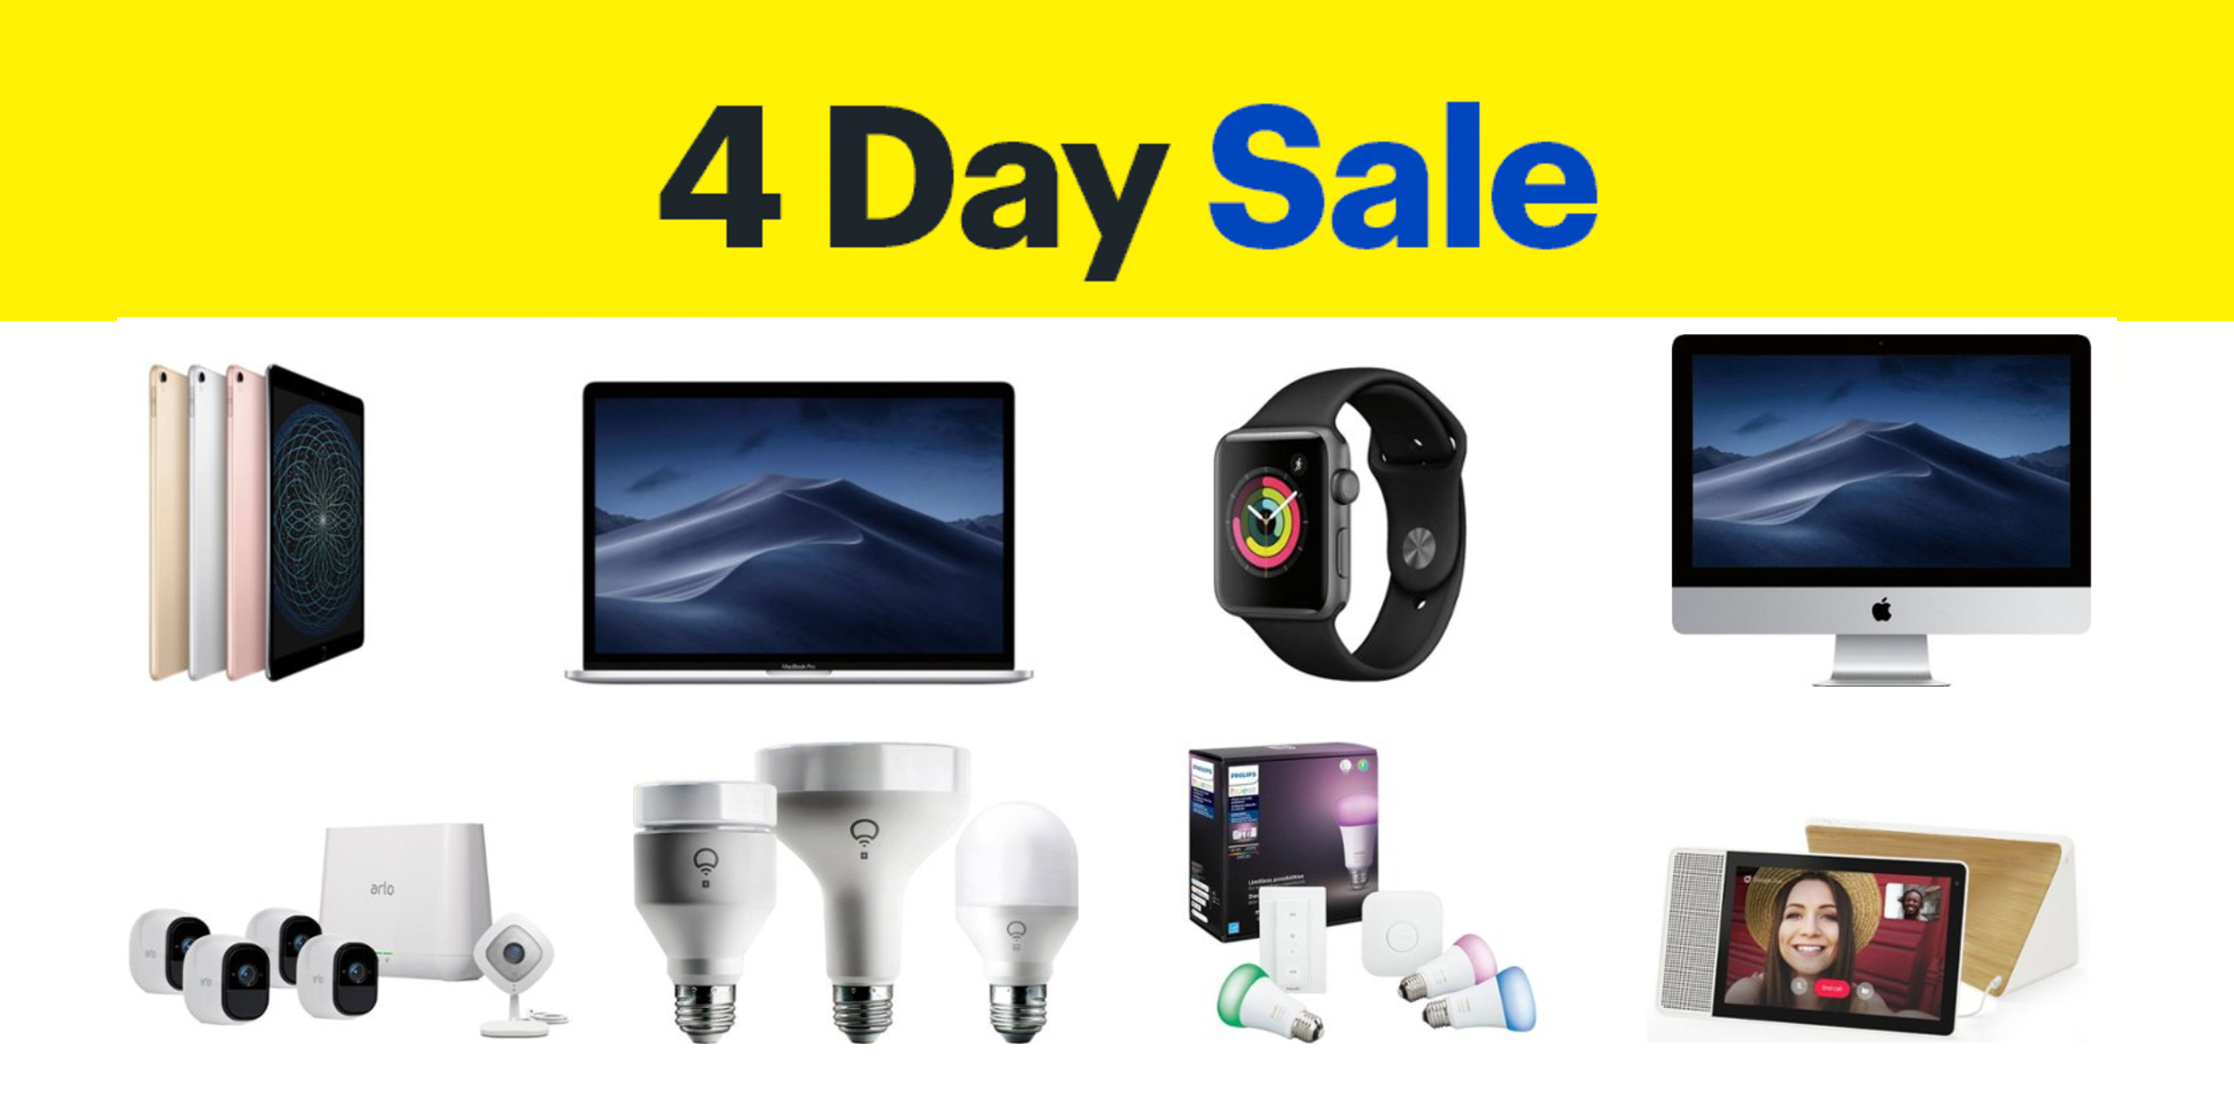 Best Buy 4-day Sale: $250 off MacBook Pro + iPad Pro, Apple Watch $100 off, TVs, much more